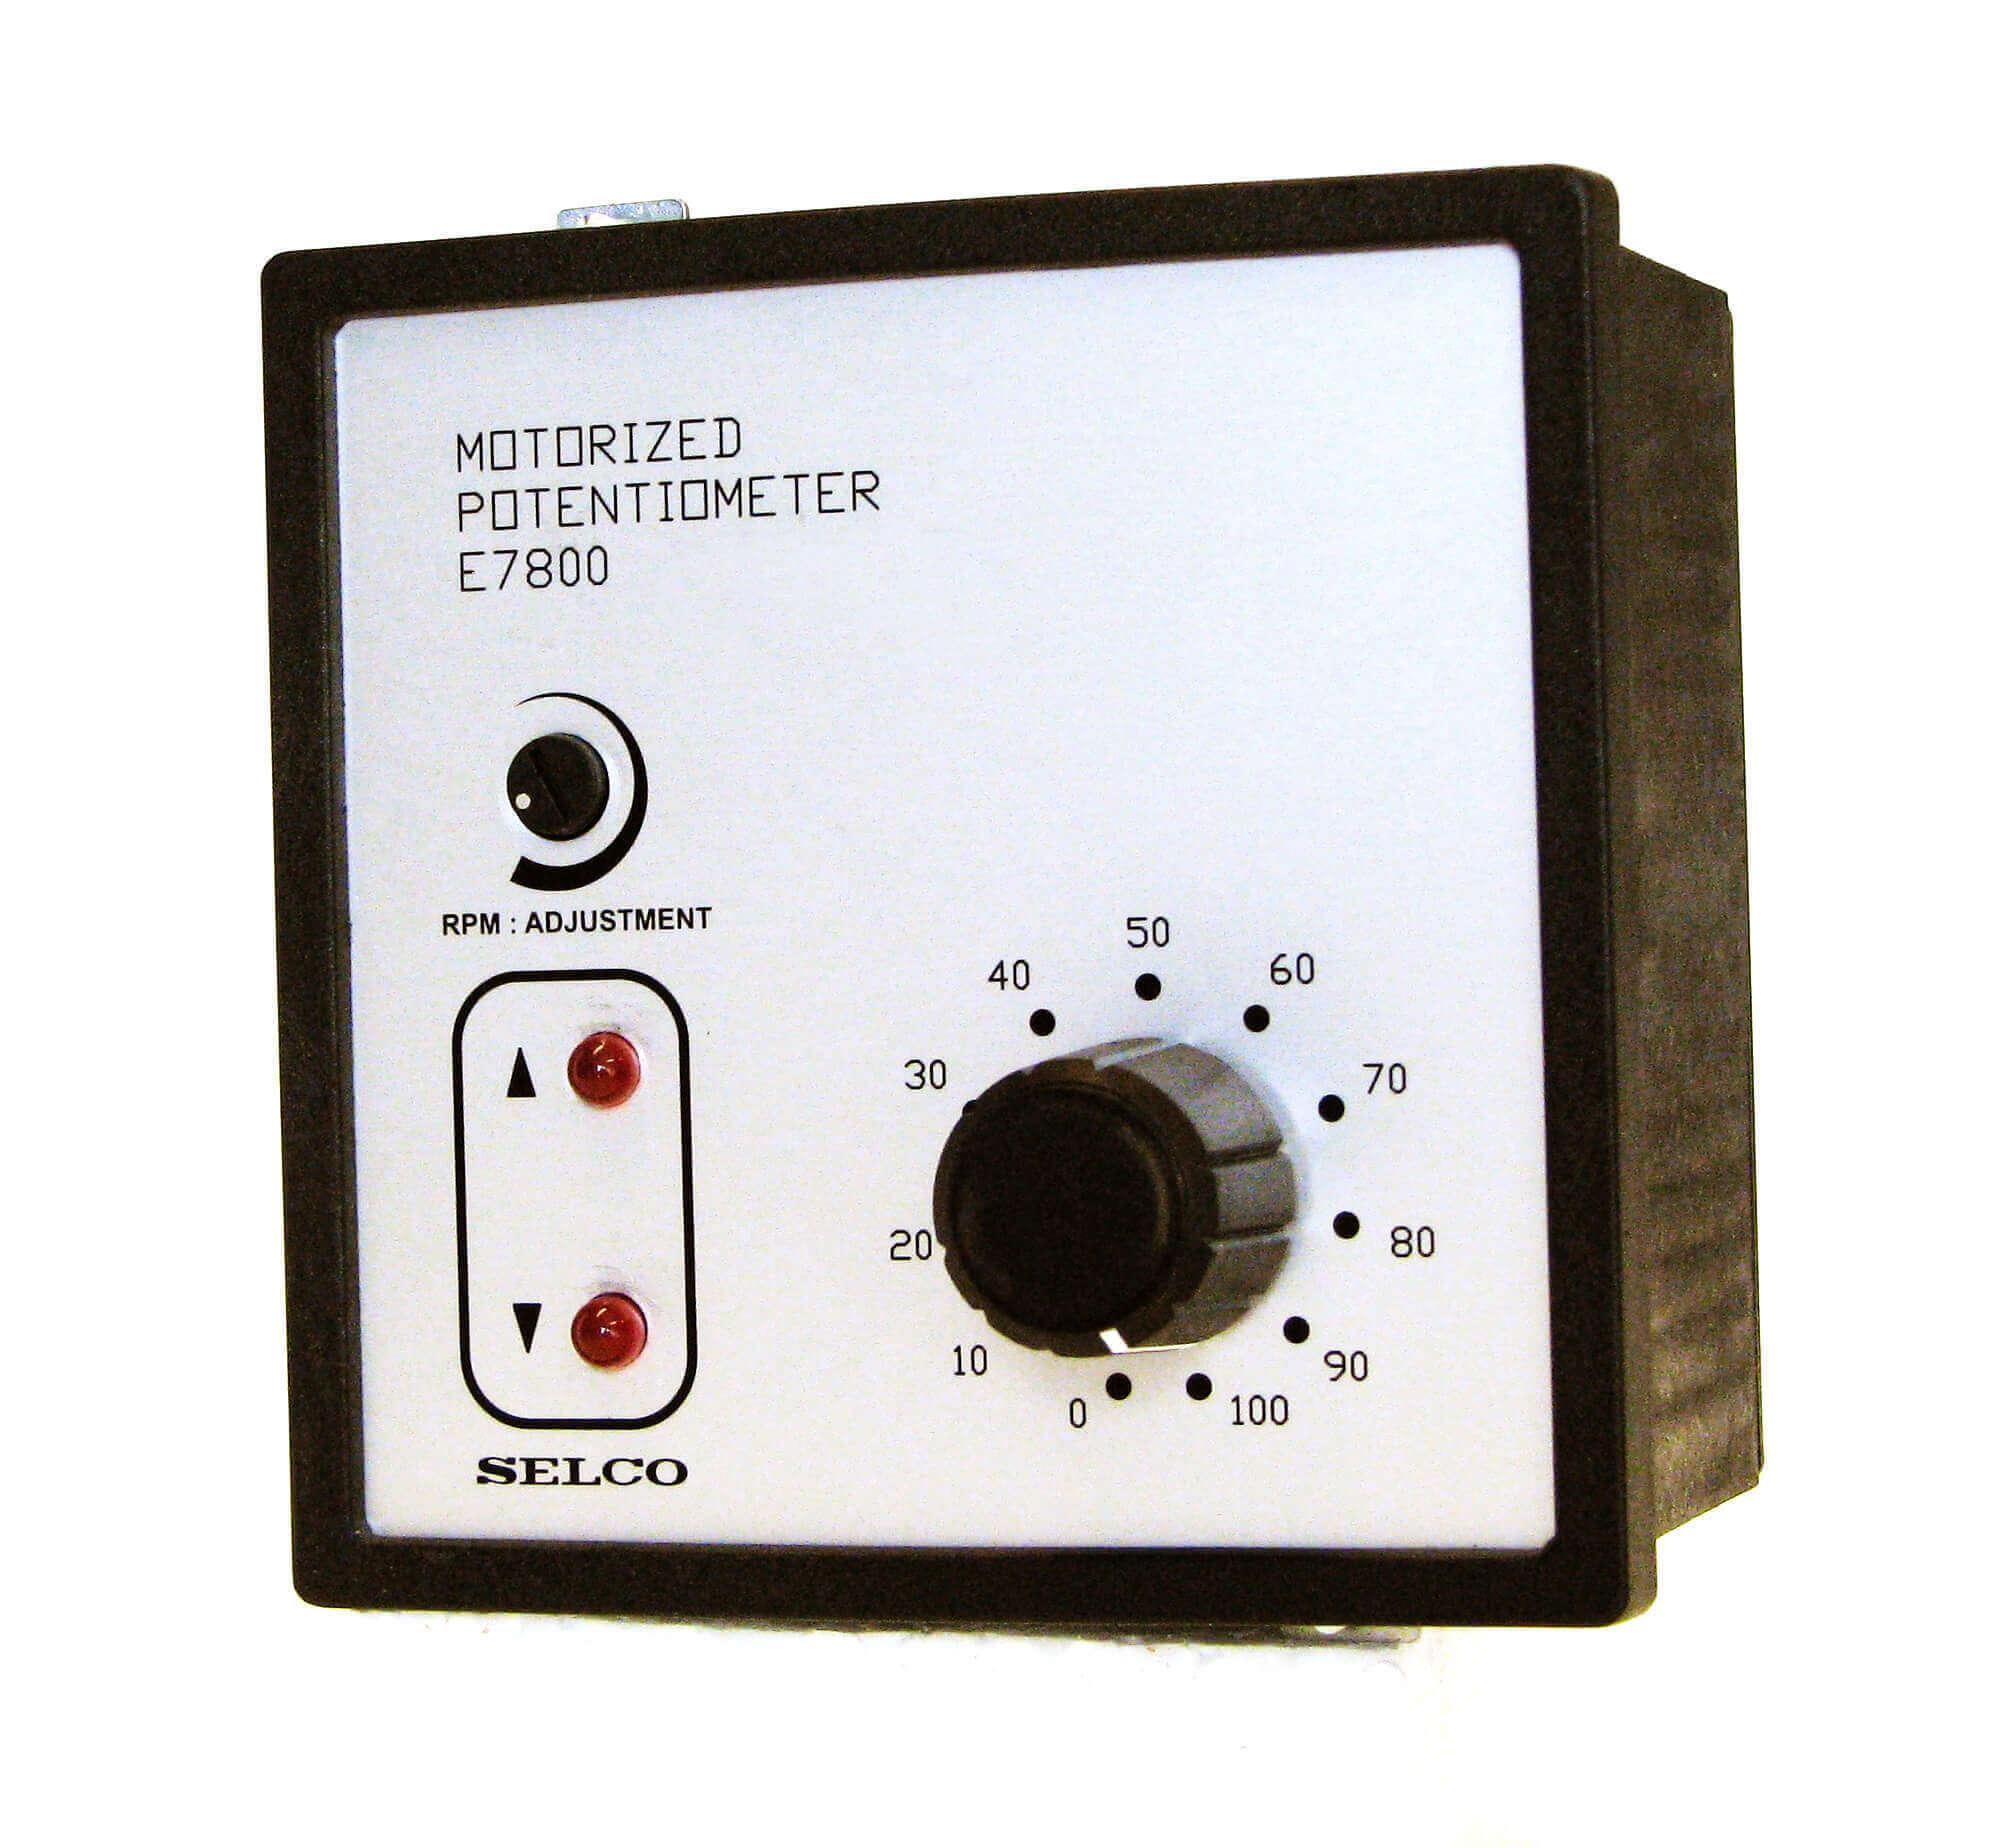 E7800 Motorized Potentiometer